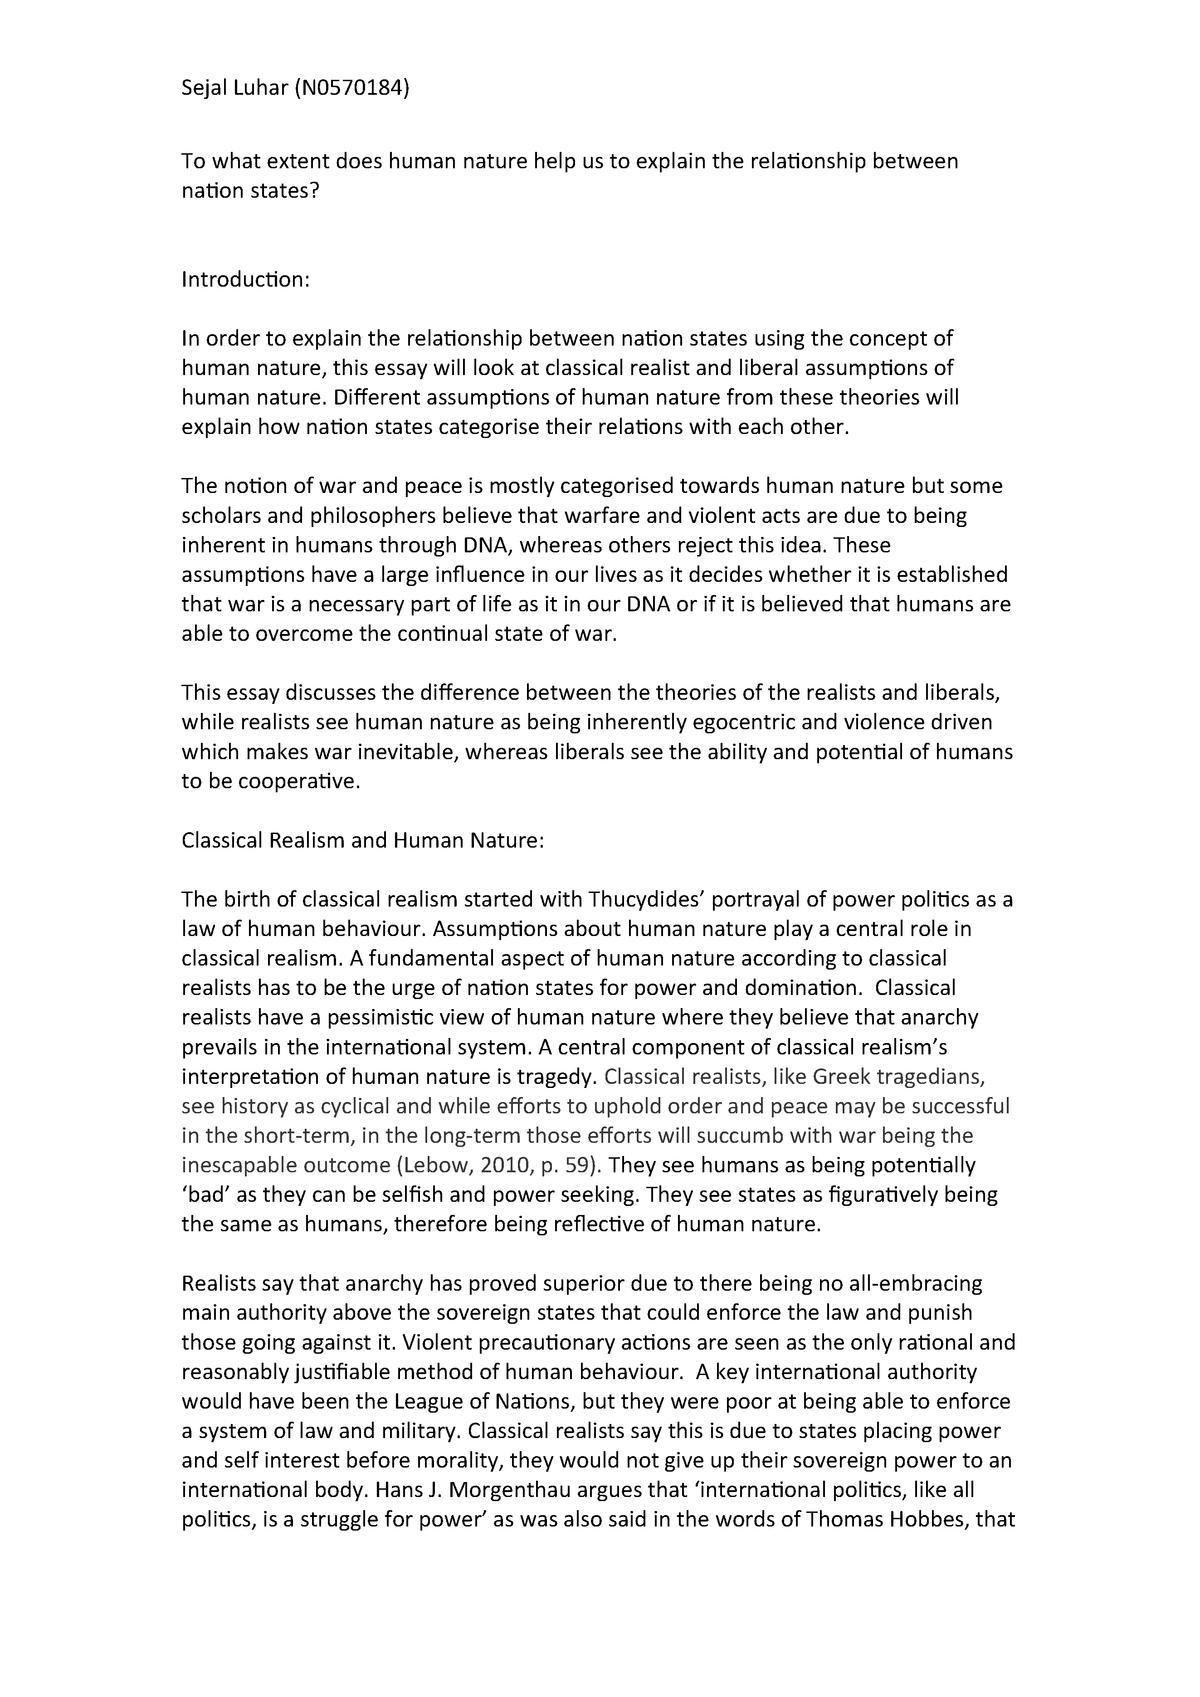 Research proposal form structure development agency management services